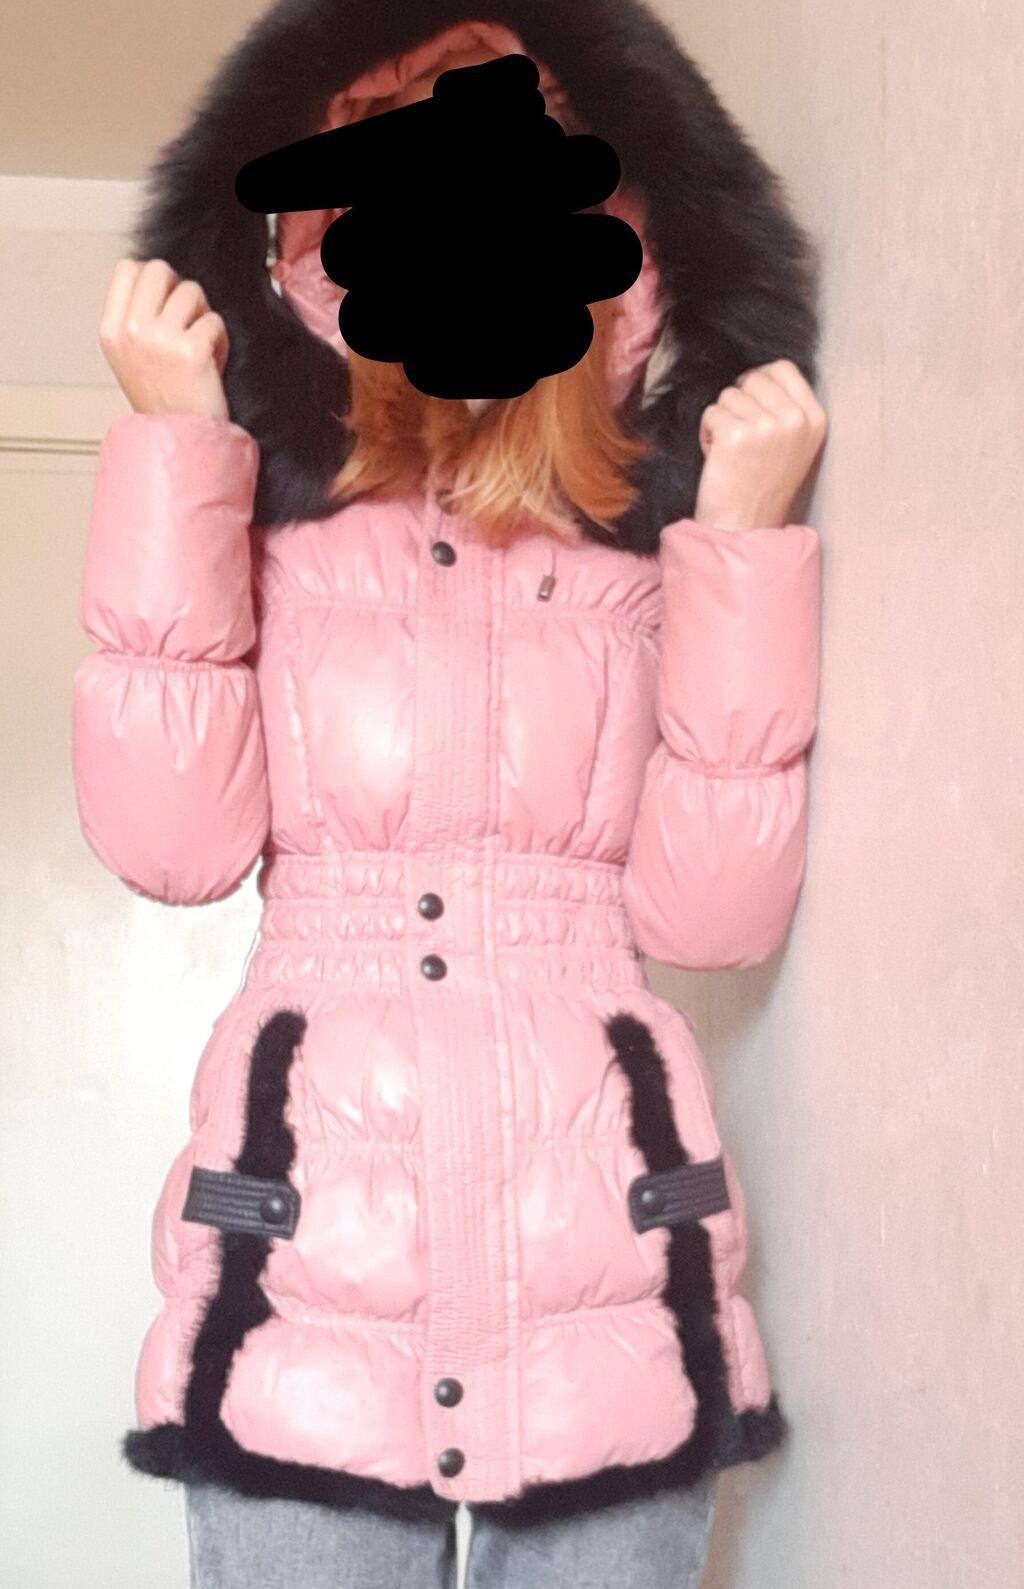 Куртка зимняя. Б/У . Мех натуральный. Размер S . Брали примерно за 6: Куртка зимняя. Б/У . Мех натуральный. Размер S . Брали примерно за 6